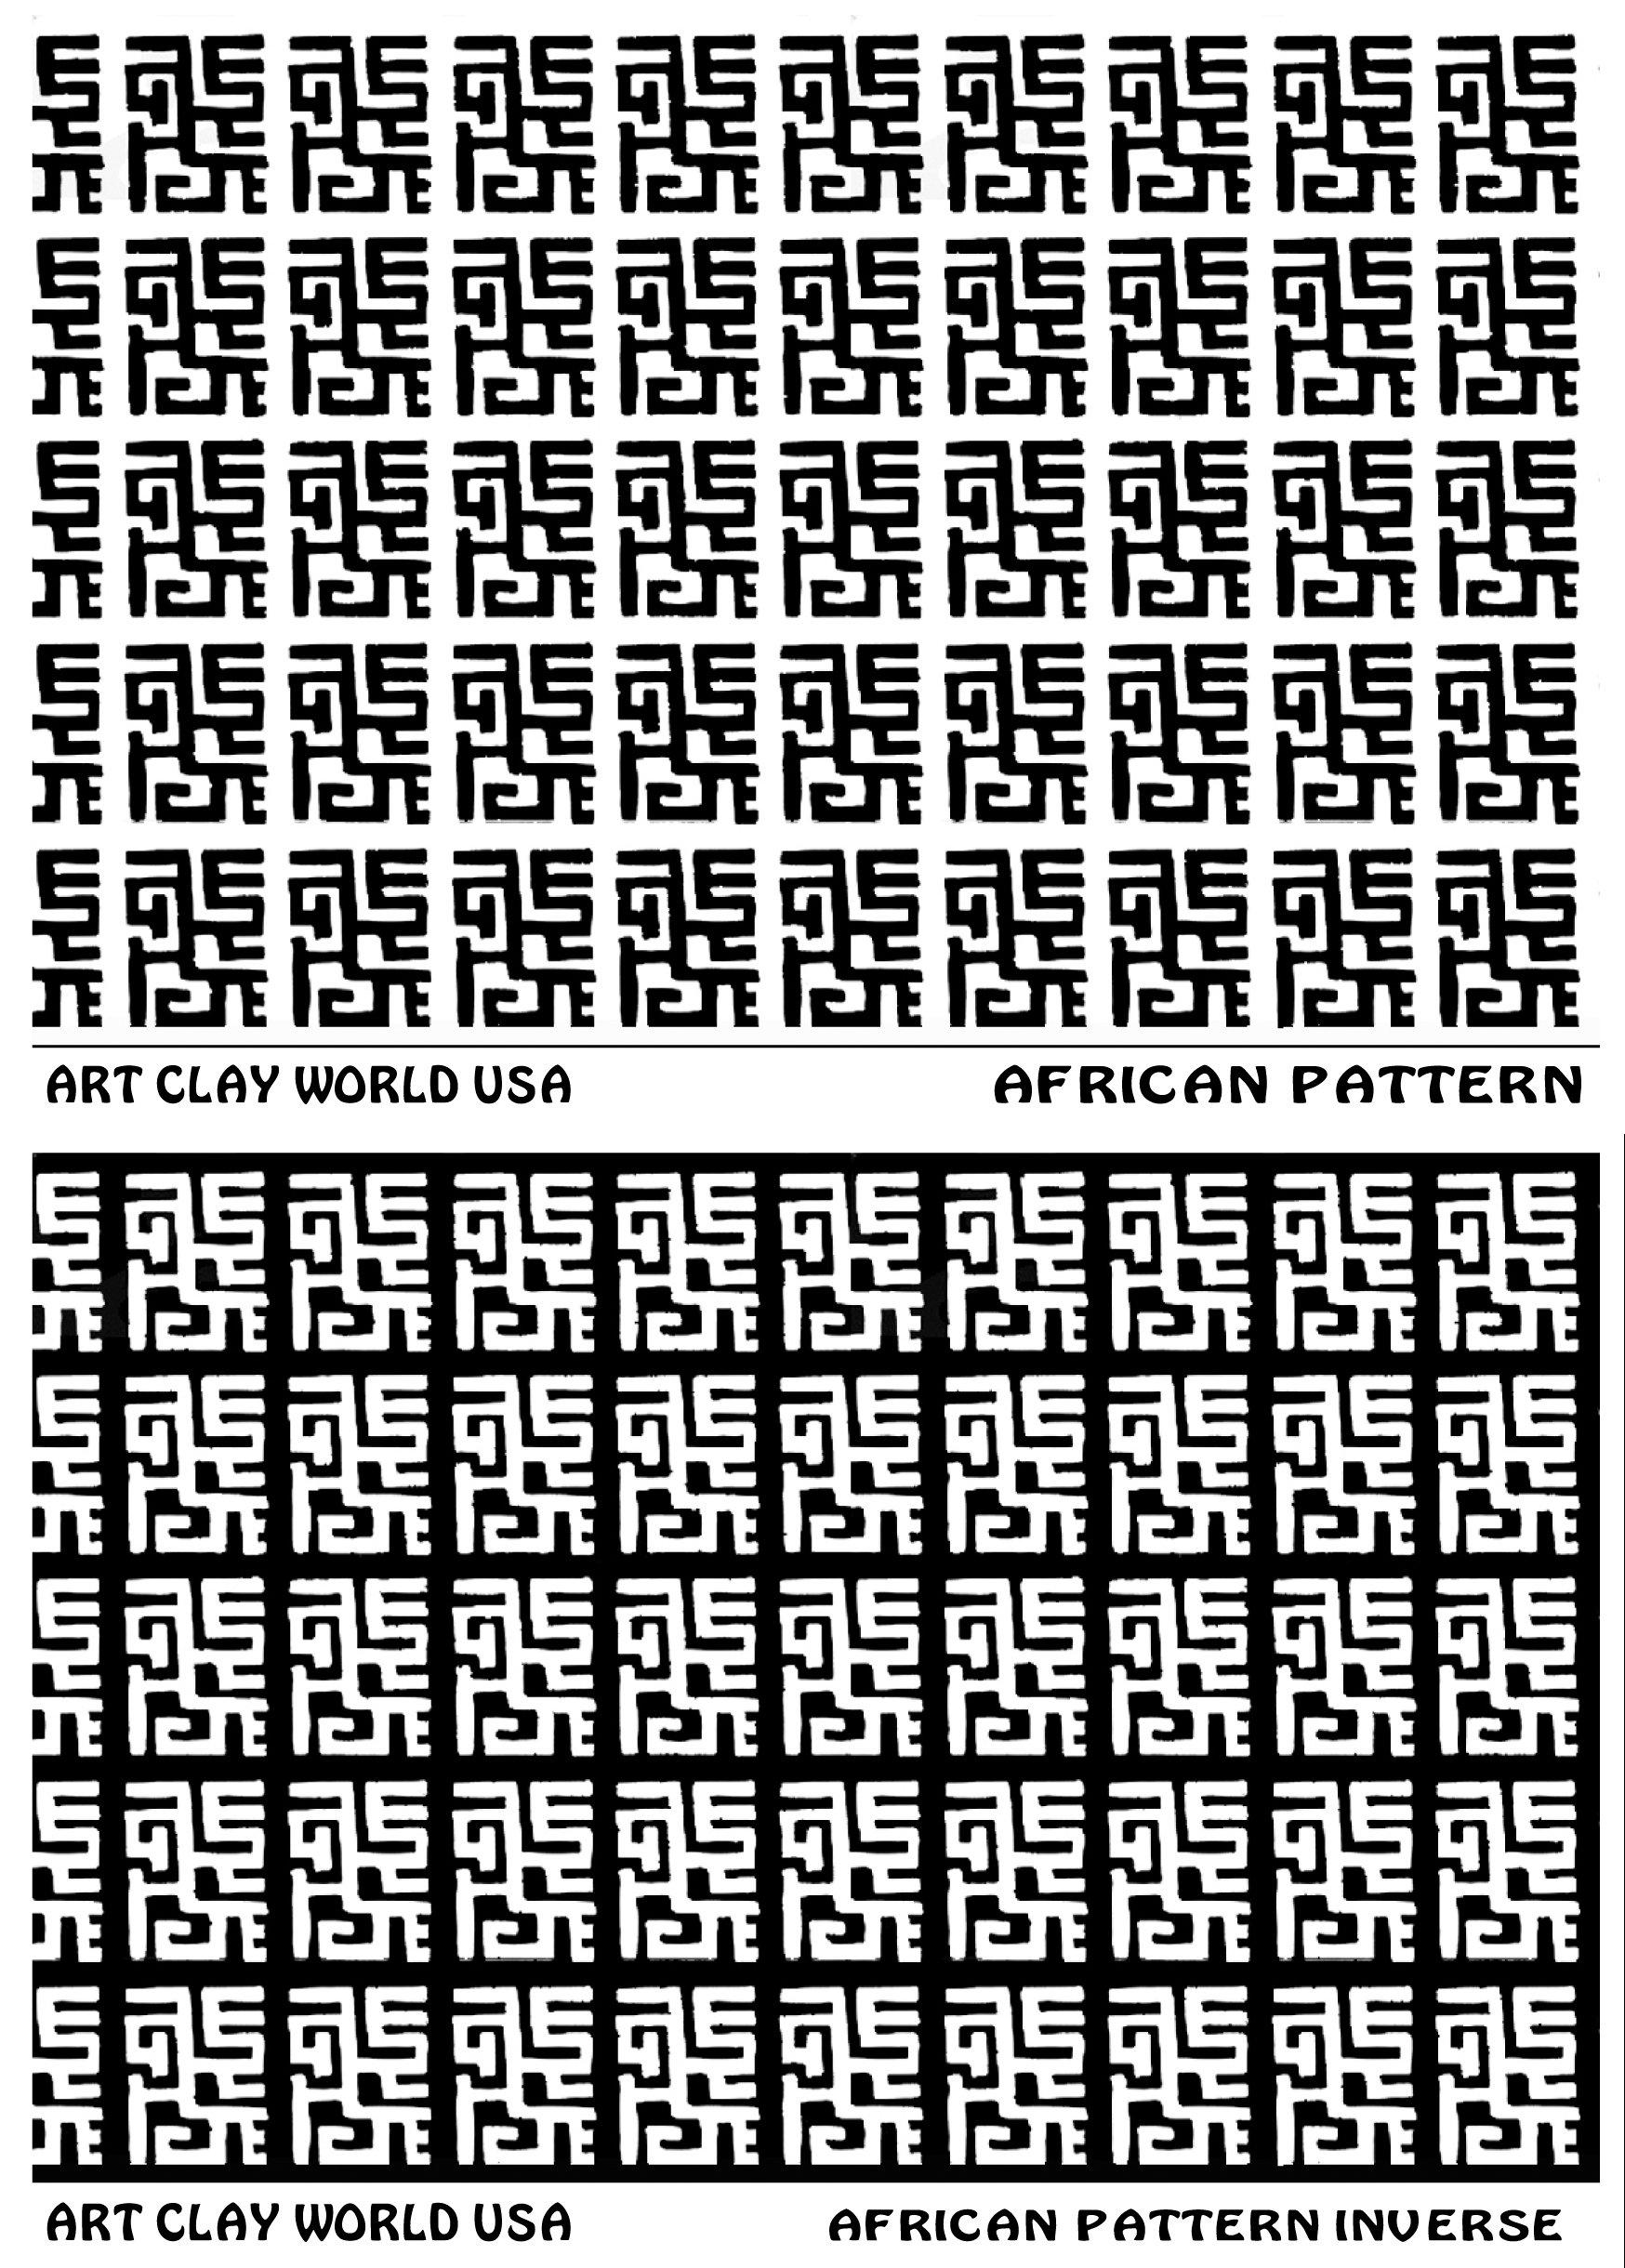 Flexistamps Texture Sheet Set African Pattern Designs (Including African Pattern and African Pattern Inverse)- 2 Pc.